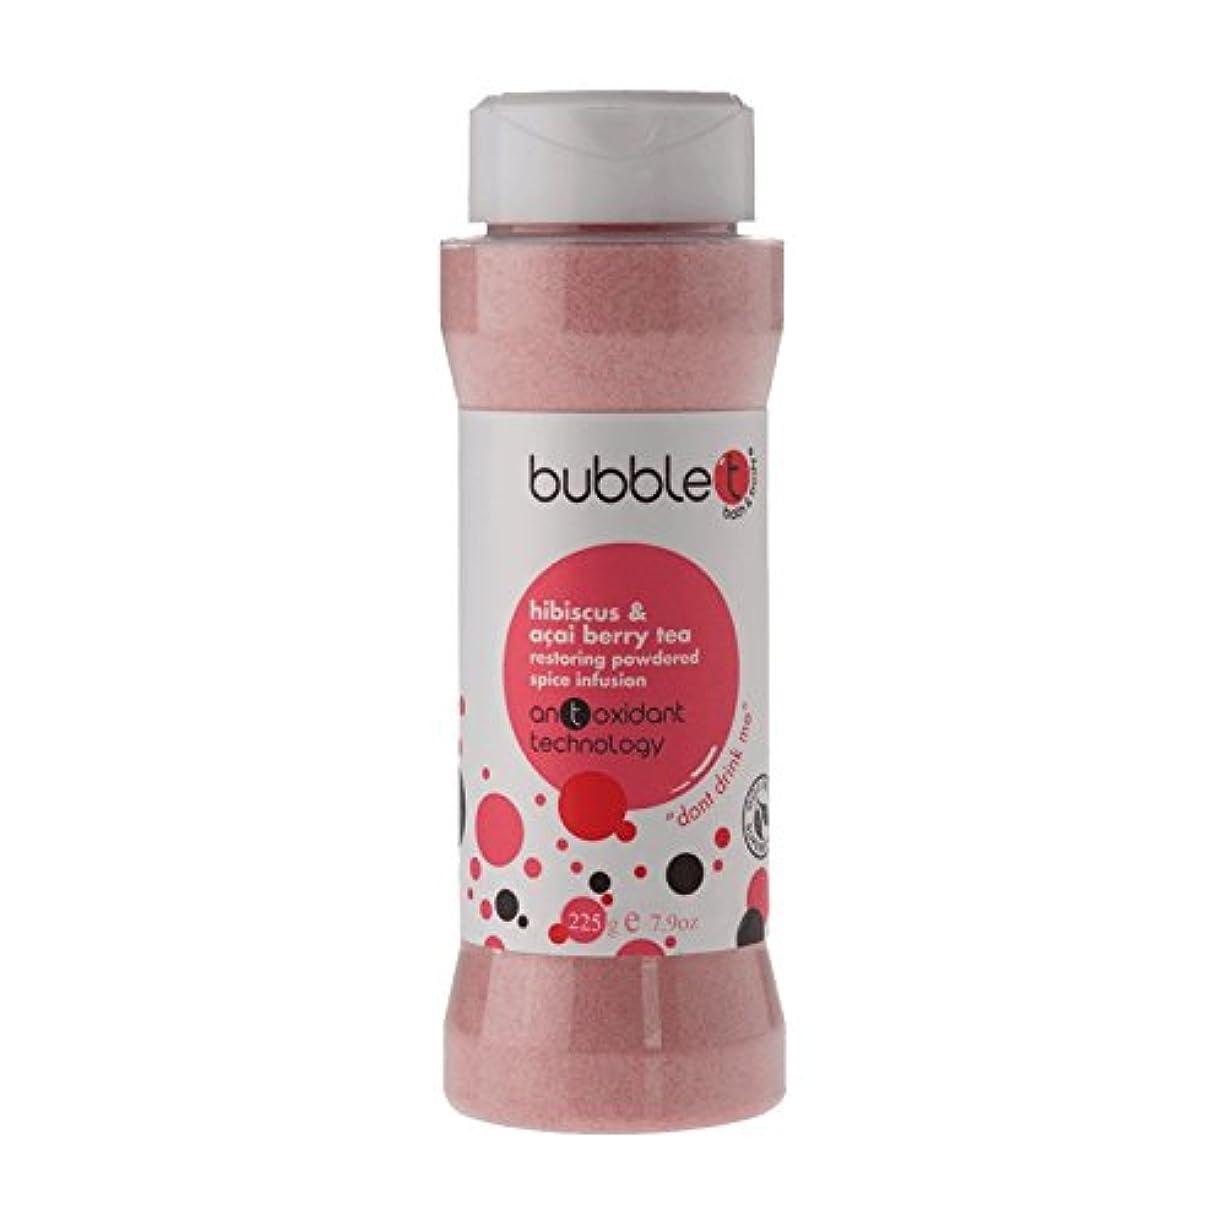 Bubble T Bath Spice Infusion Hibiscus & Acai Berry Tea 225g (Pack of 6) - バブルトン風呂スパイス注入ハイビスカス&アサイベリー茶225グラム (x6...